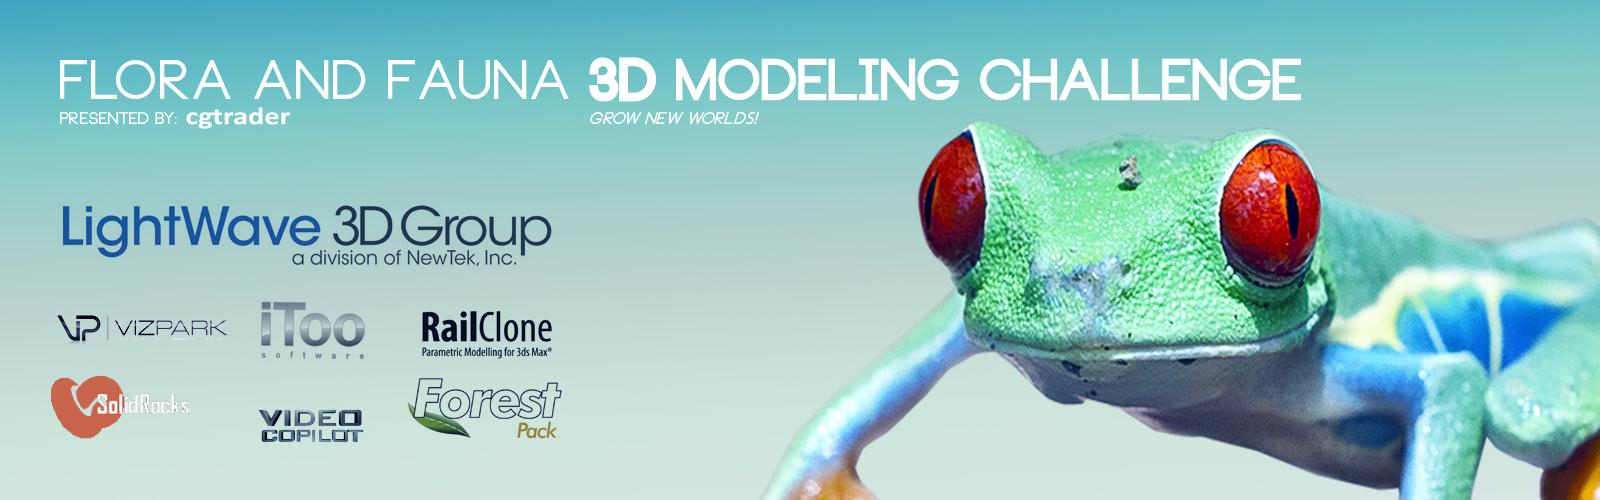 Flora & Fauna 3D Modeling Challenge